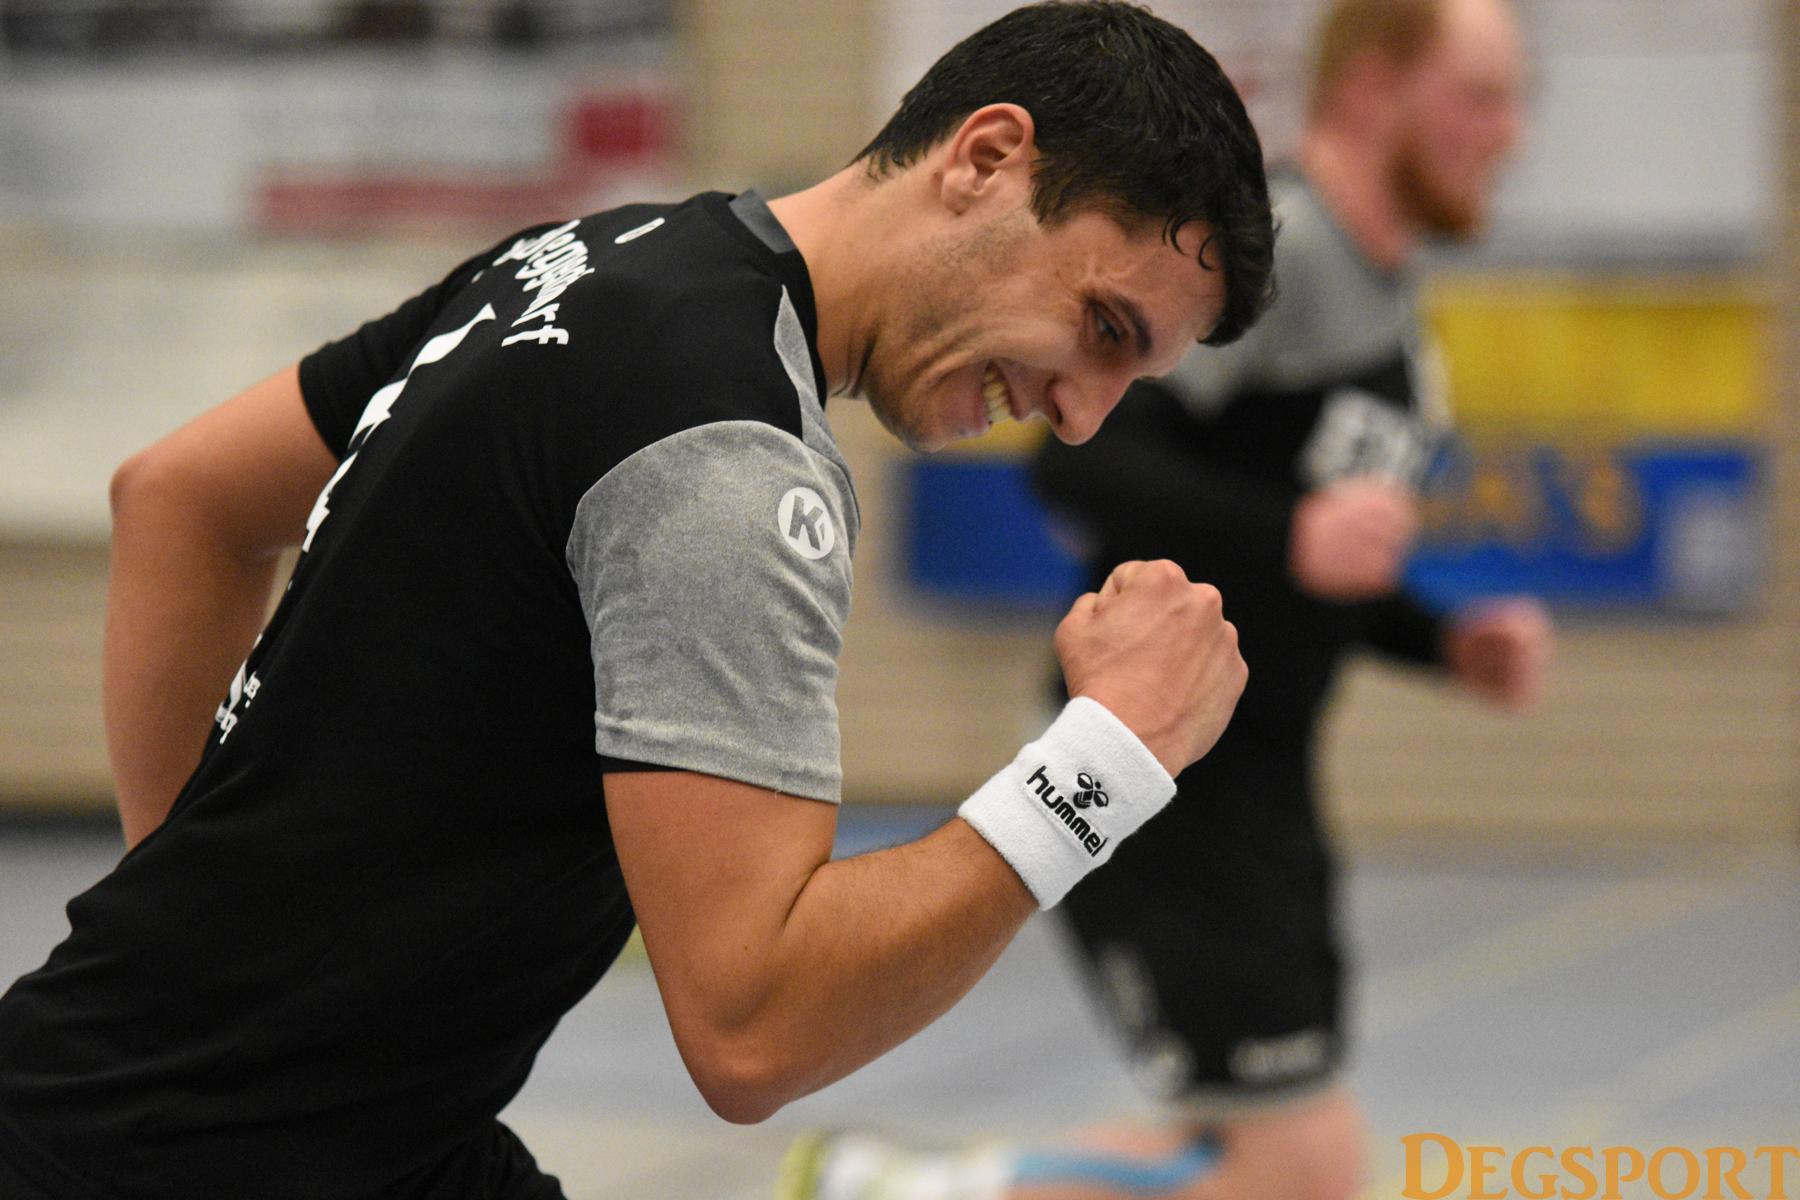 Deggendorfer Handballer starten nach langer Pause